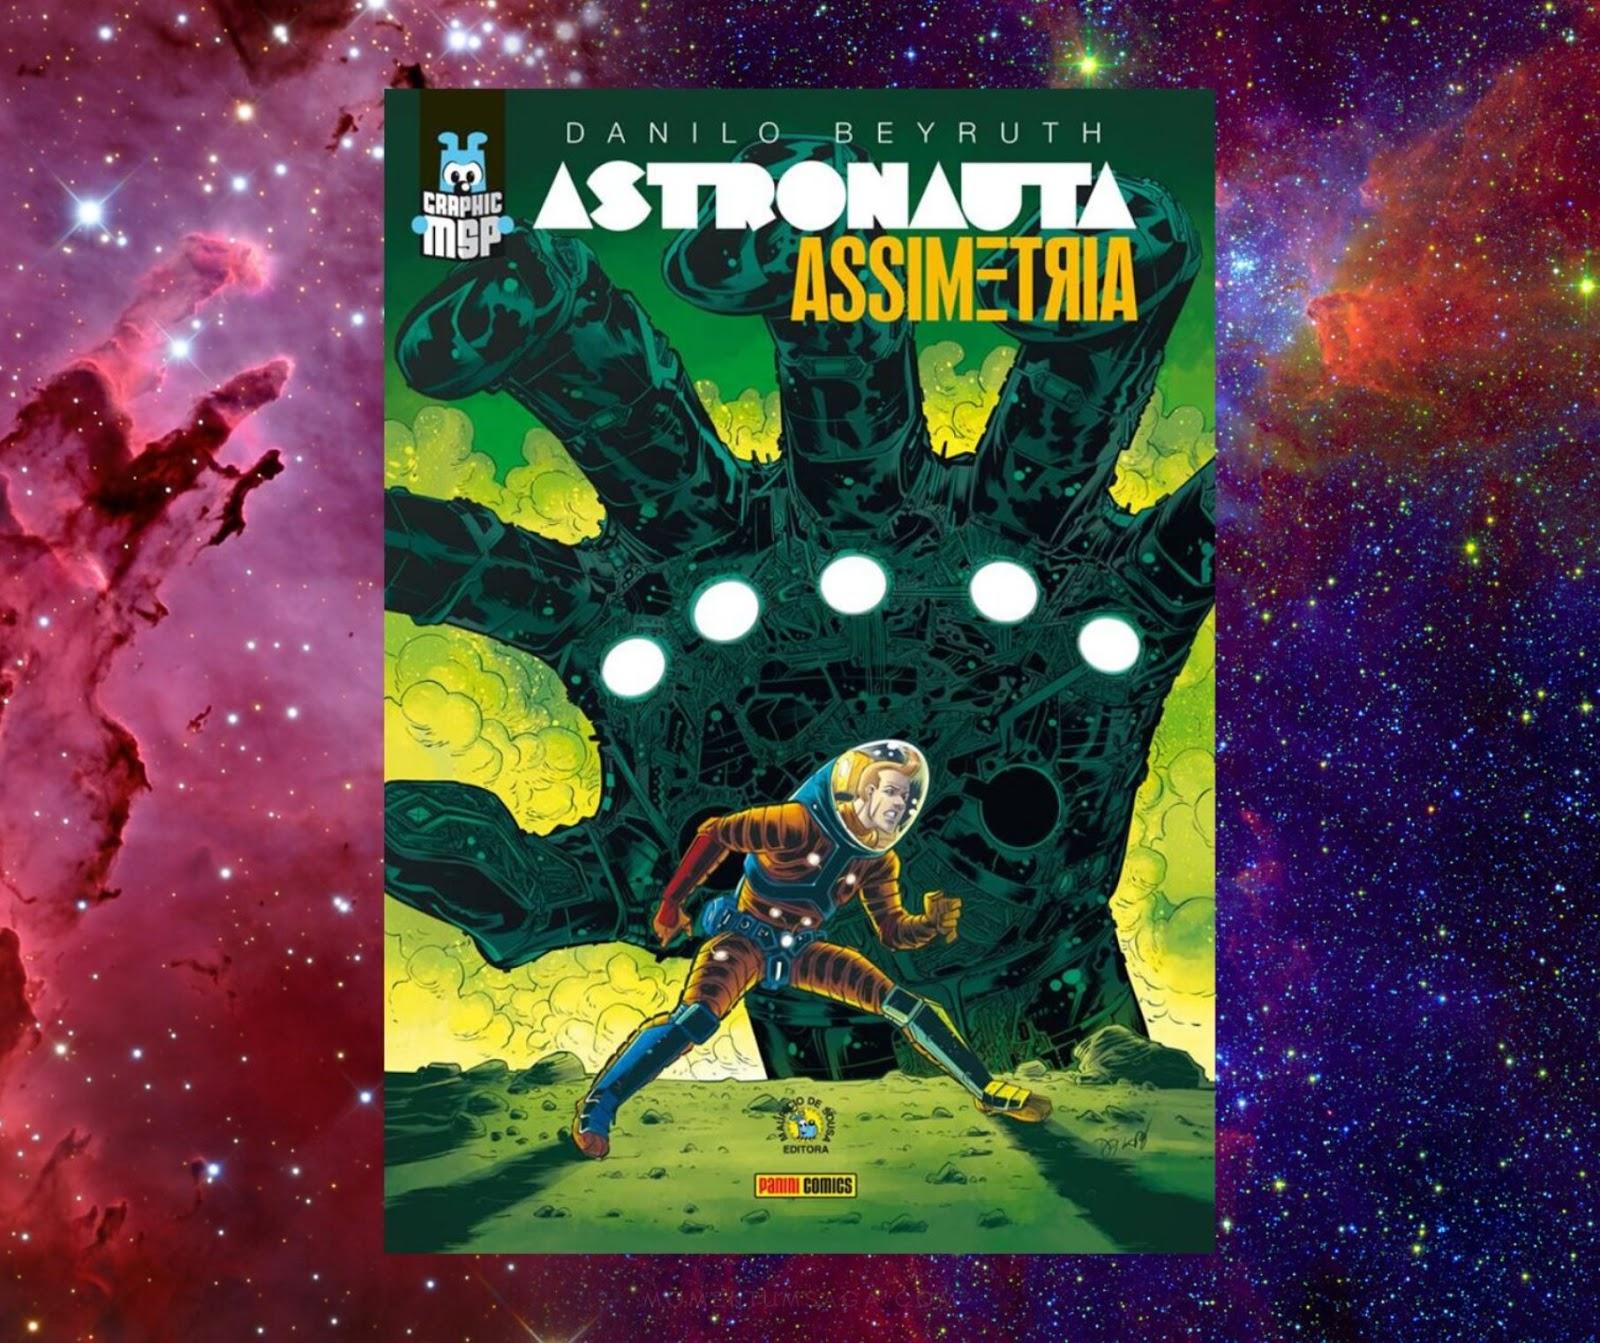 Resenha: Astronauta - Assimetria, de Danilo Beyruth